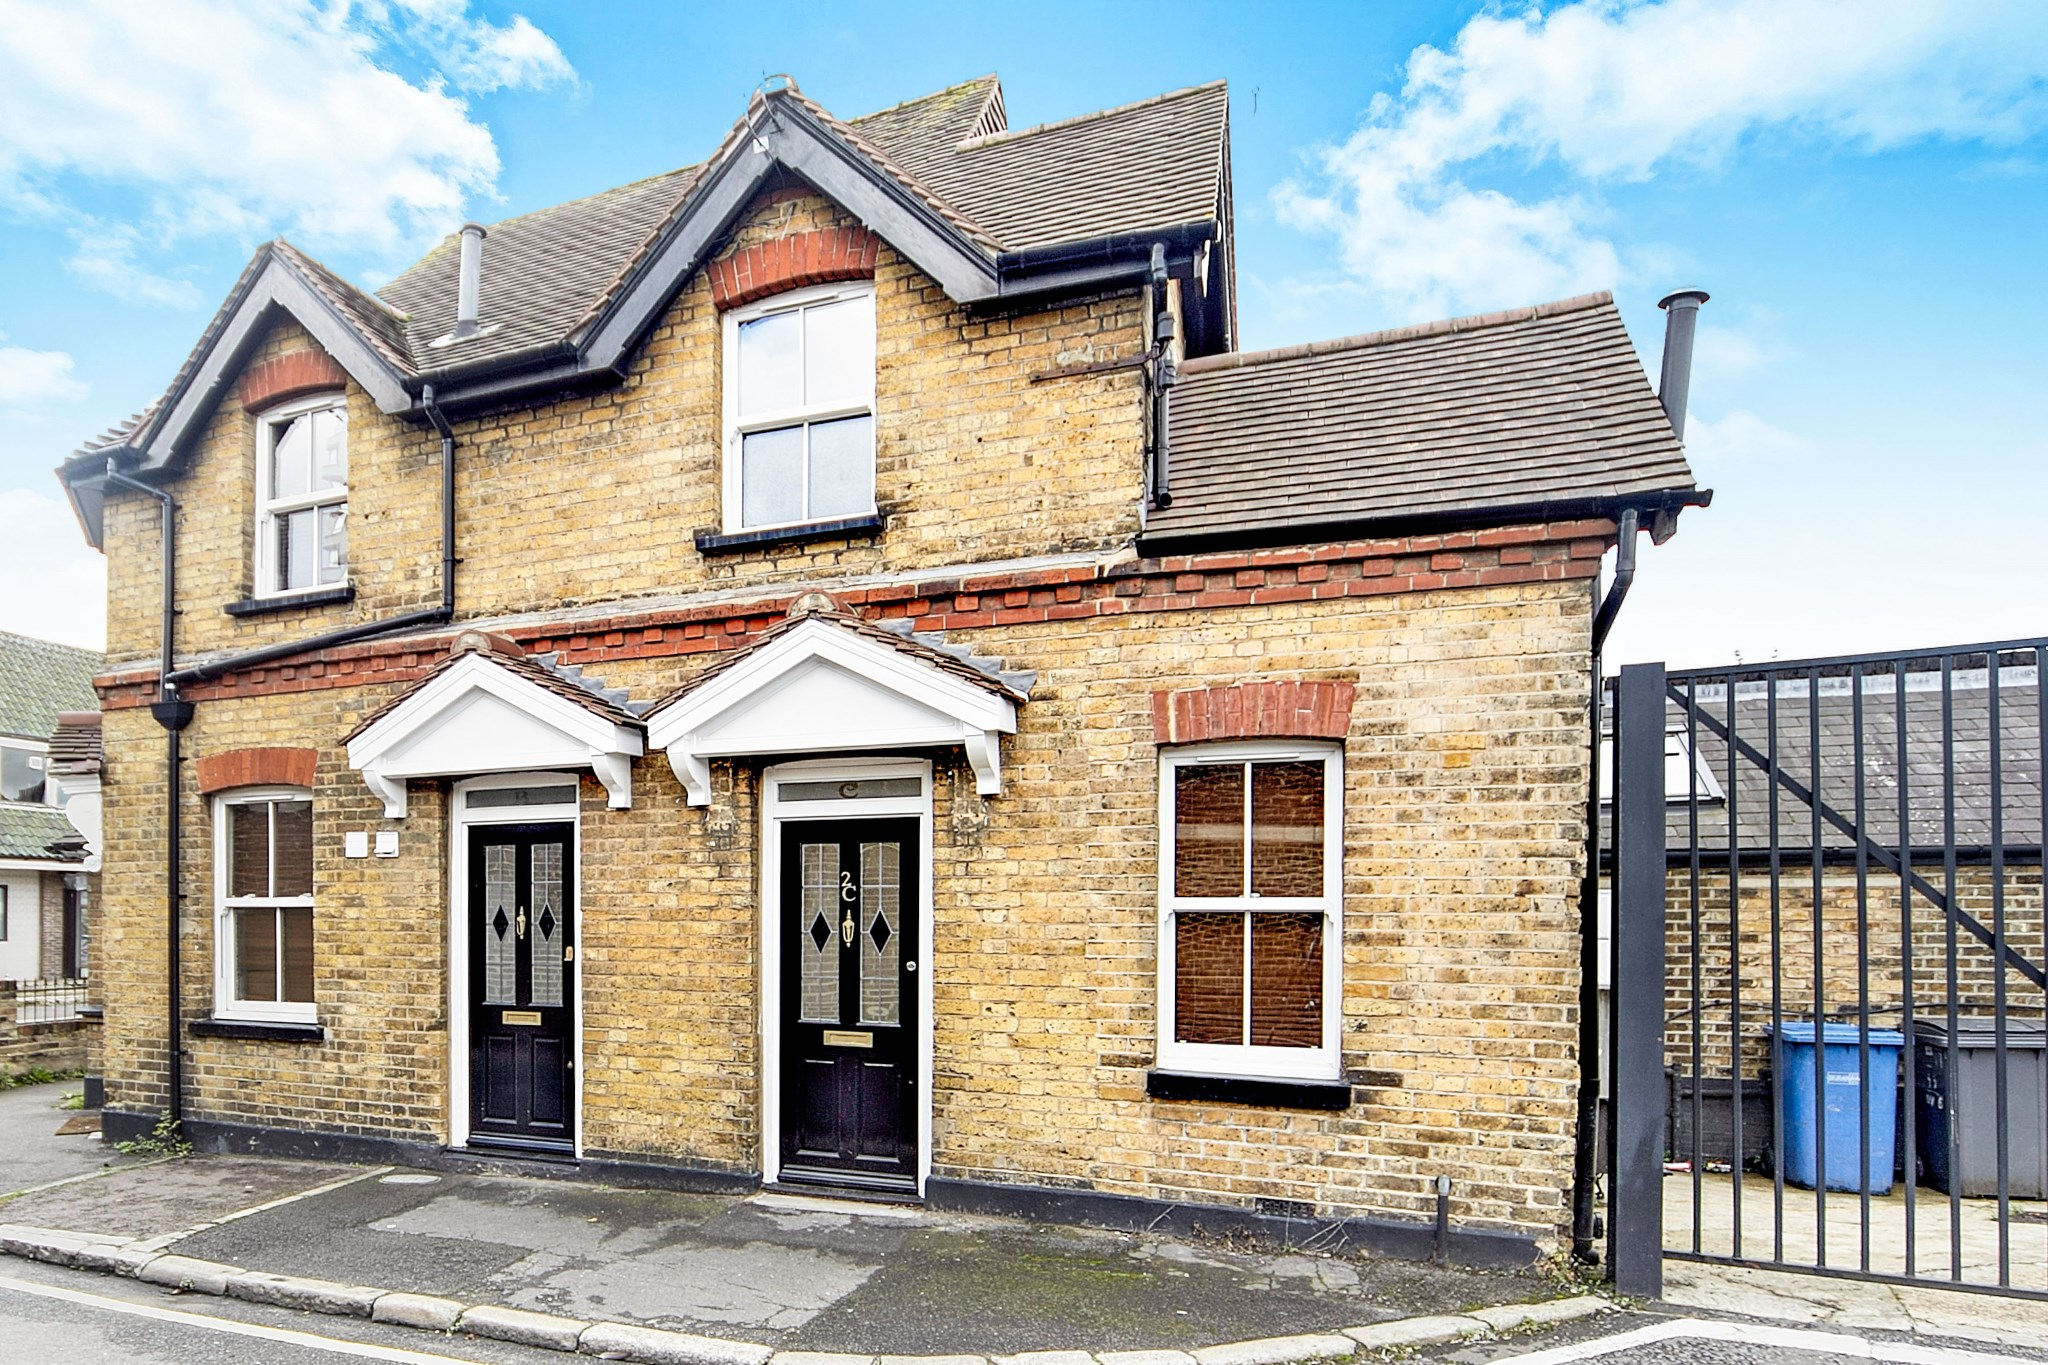 Lamberts Place, East Croydon, Croydon, Surrey, CR0